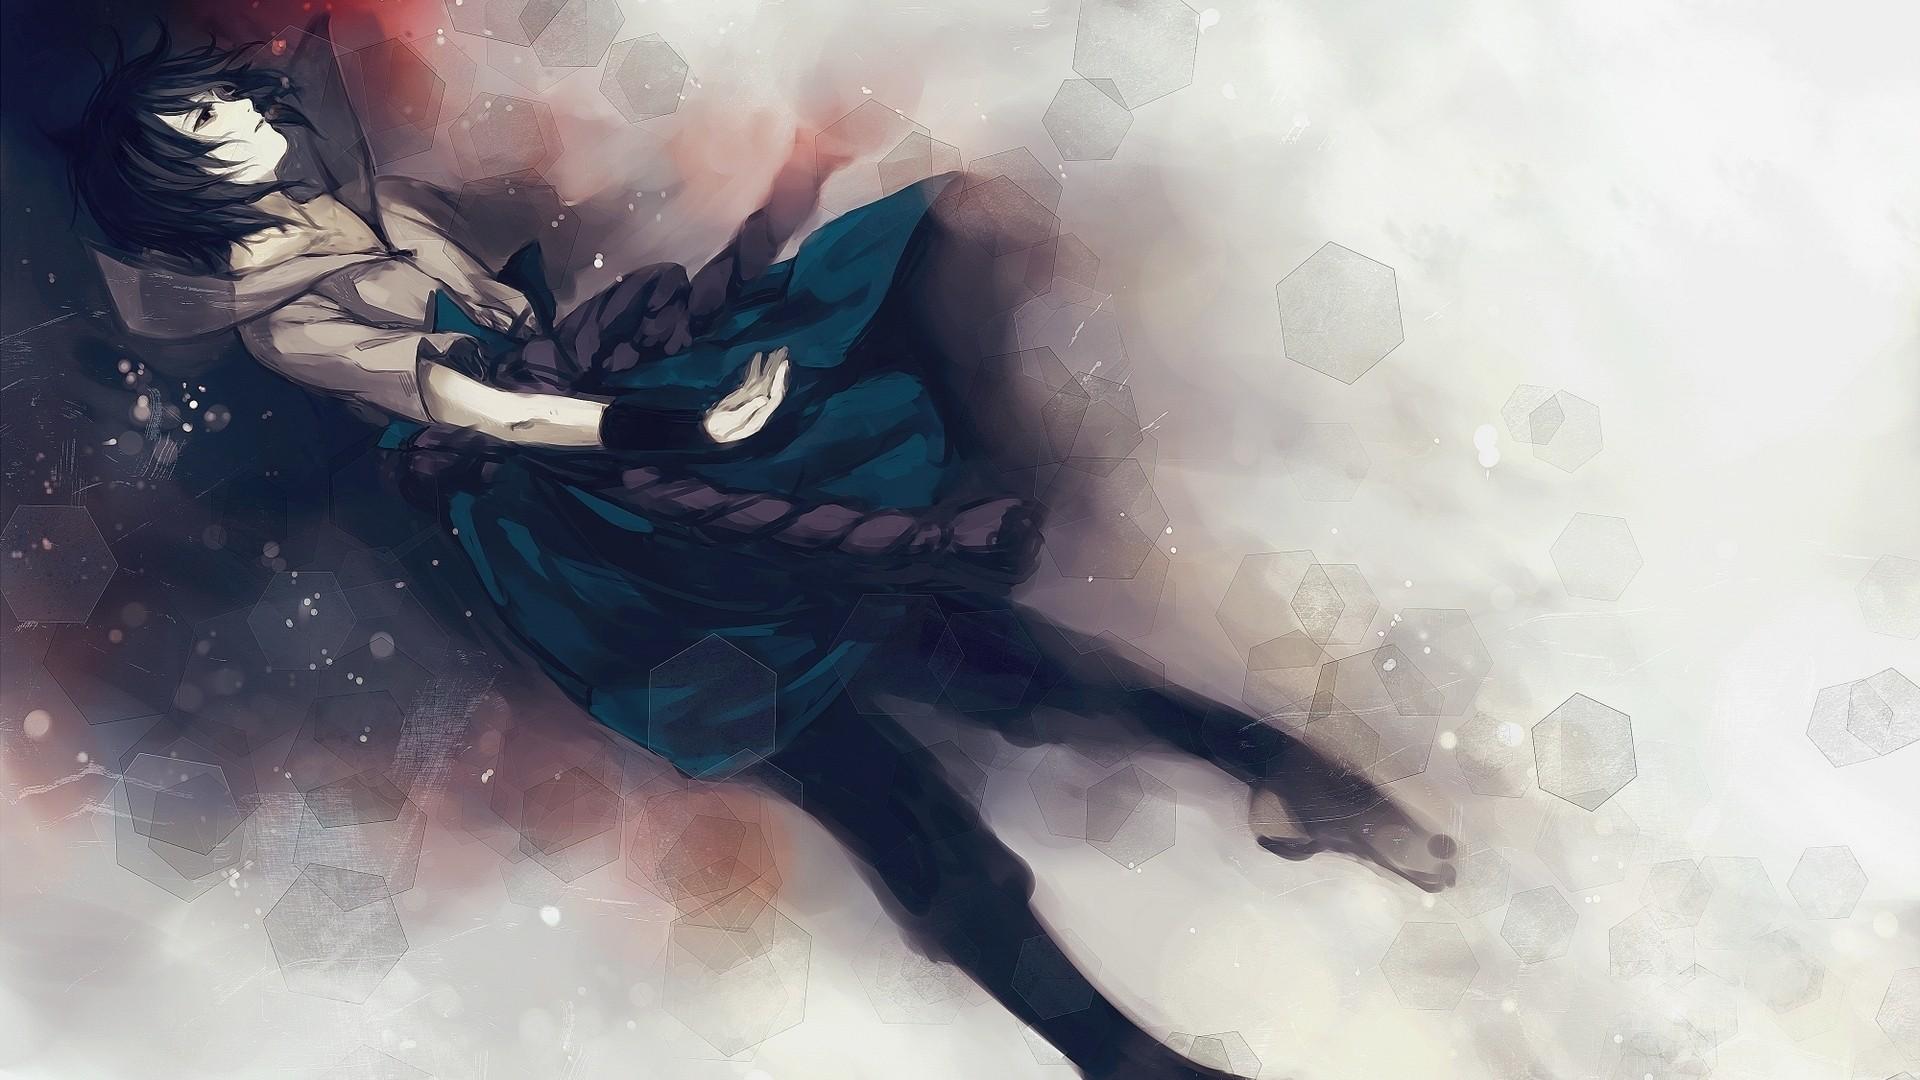 Tags: Anime, NARUTO, Uchiha Sasuke, Wallpaper, HD Wallpaper, Facebook Cover